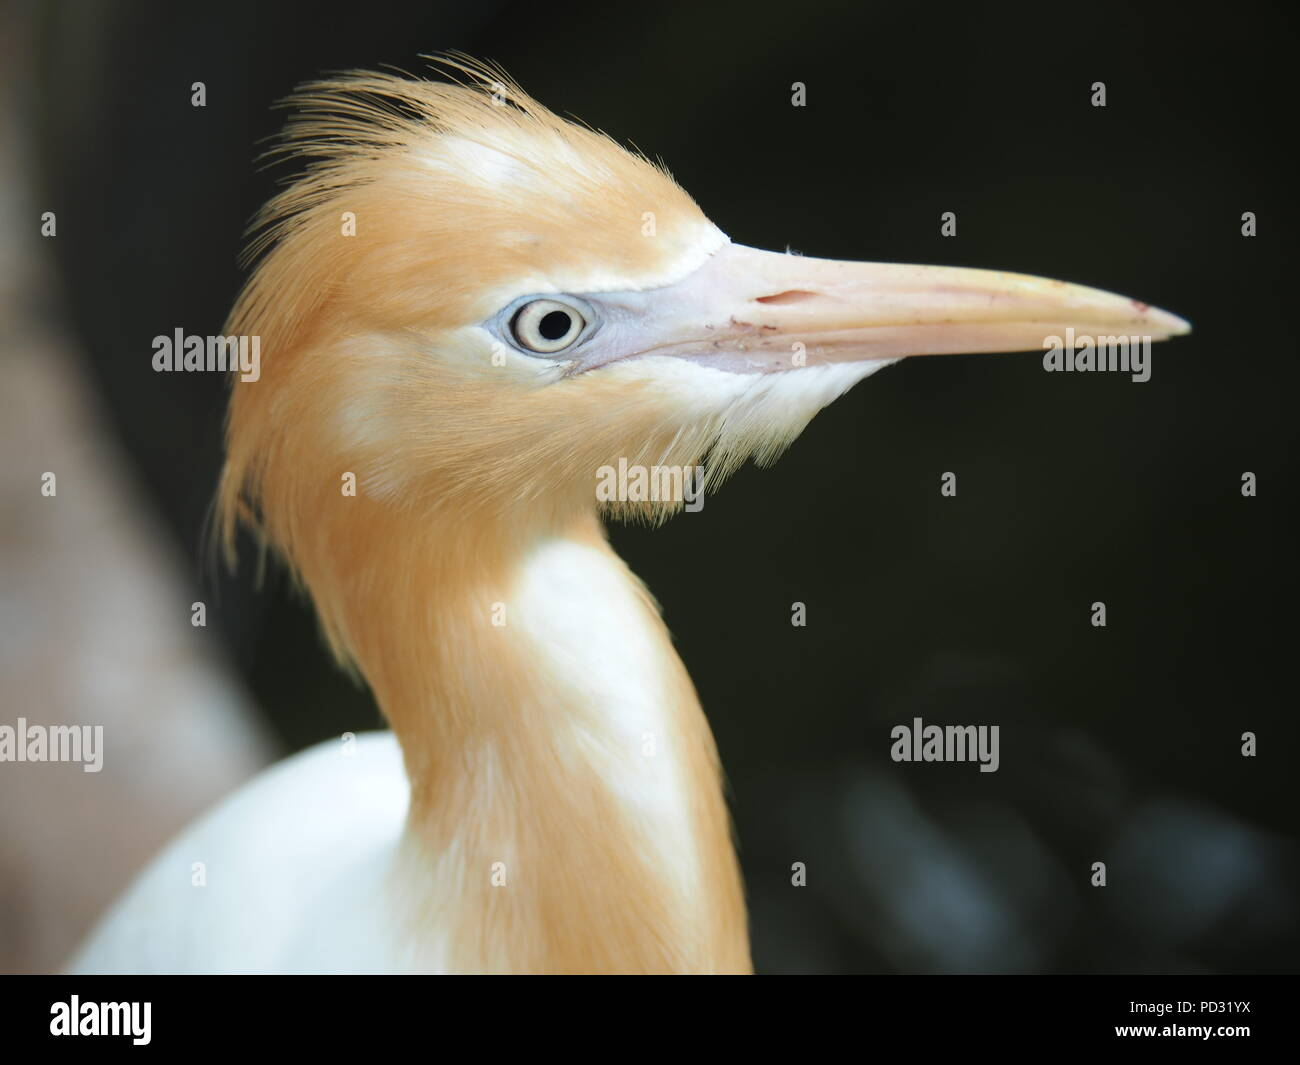 Cattle Egret Bird - Stock Image